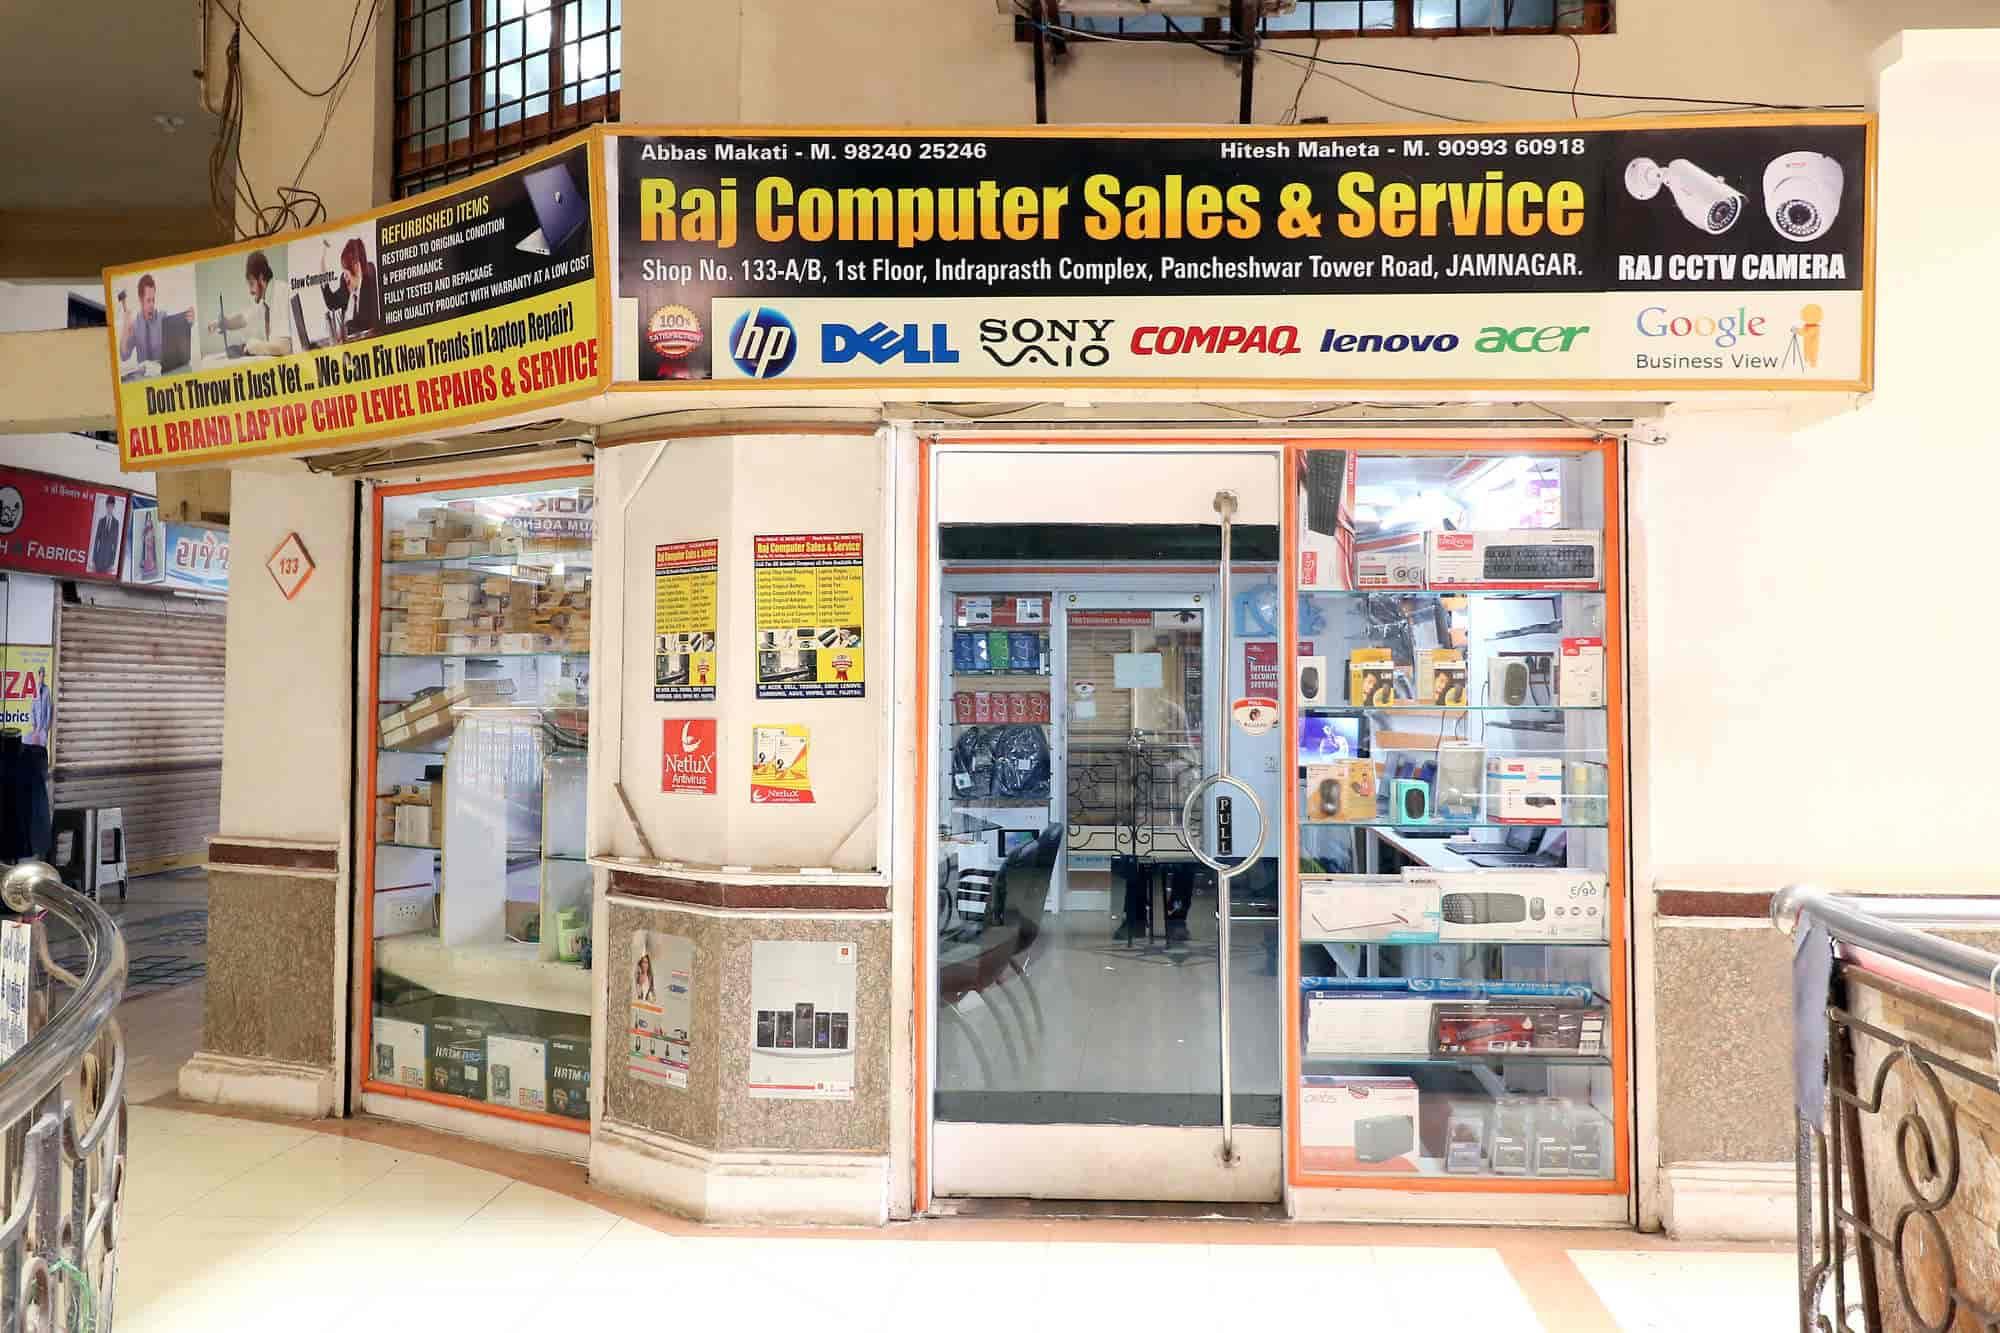 Raj Computer Sales Service Pancheshwar Tower Chowk Laptop Repair Hp Makati Services In Jamnagar Justdial